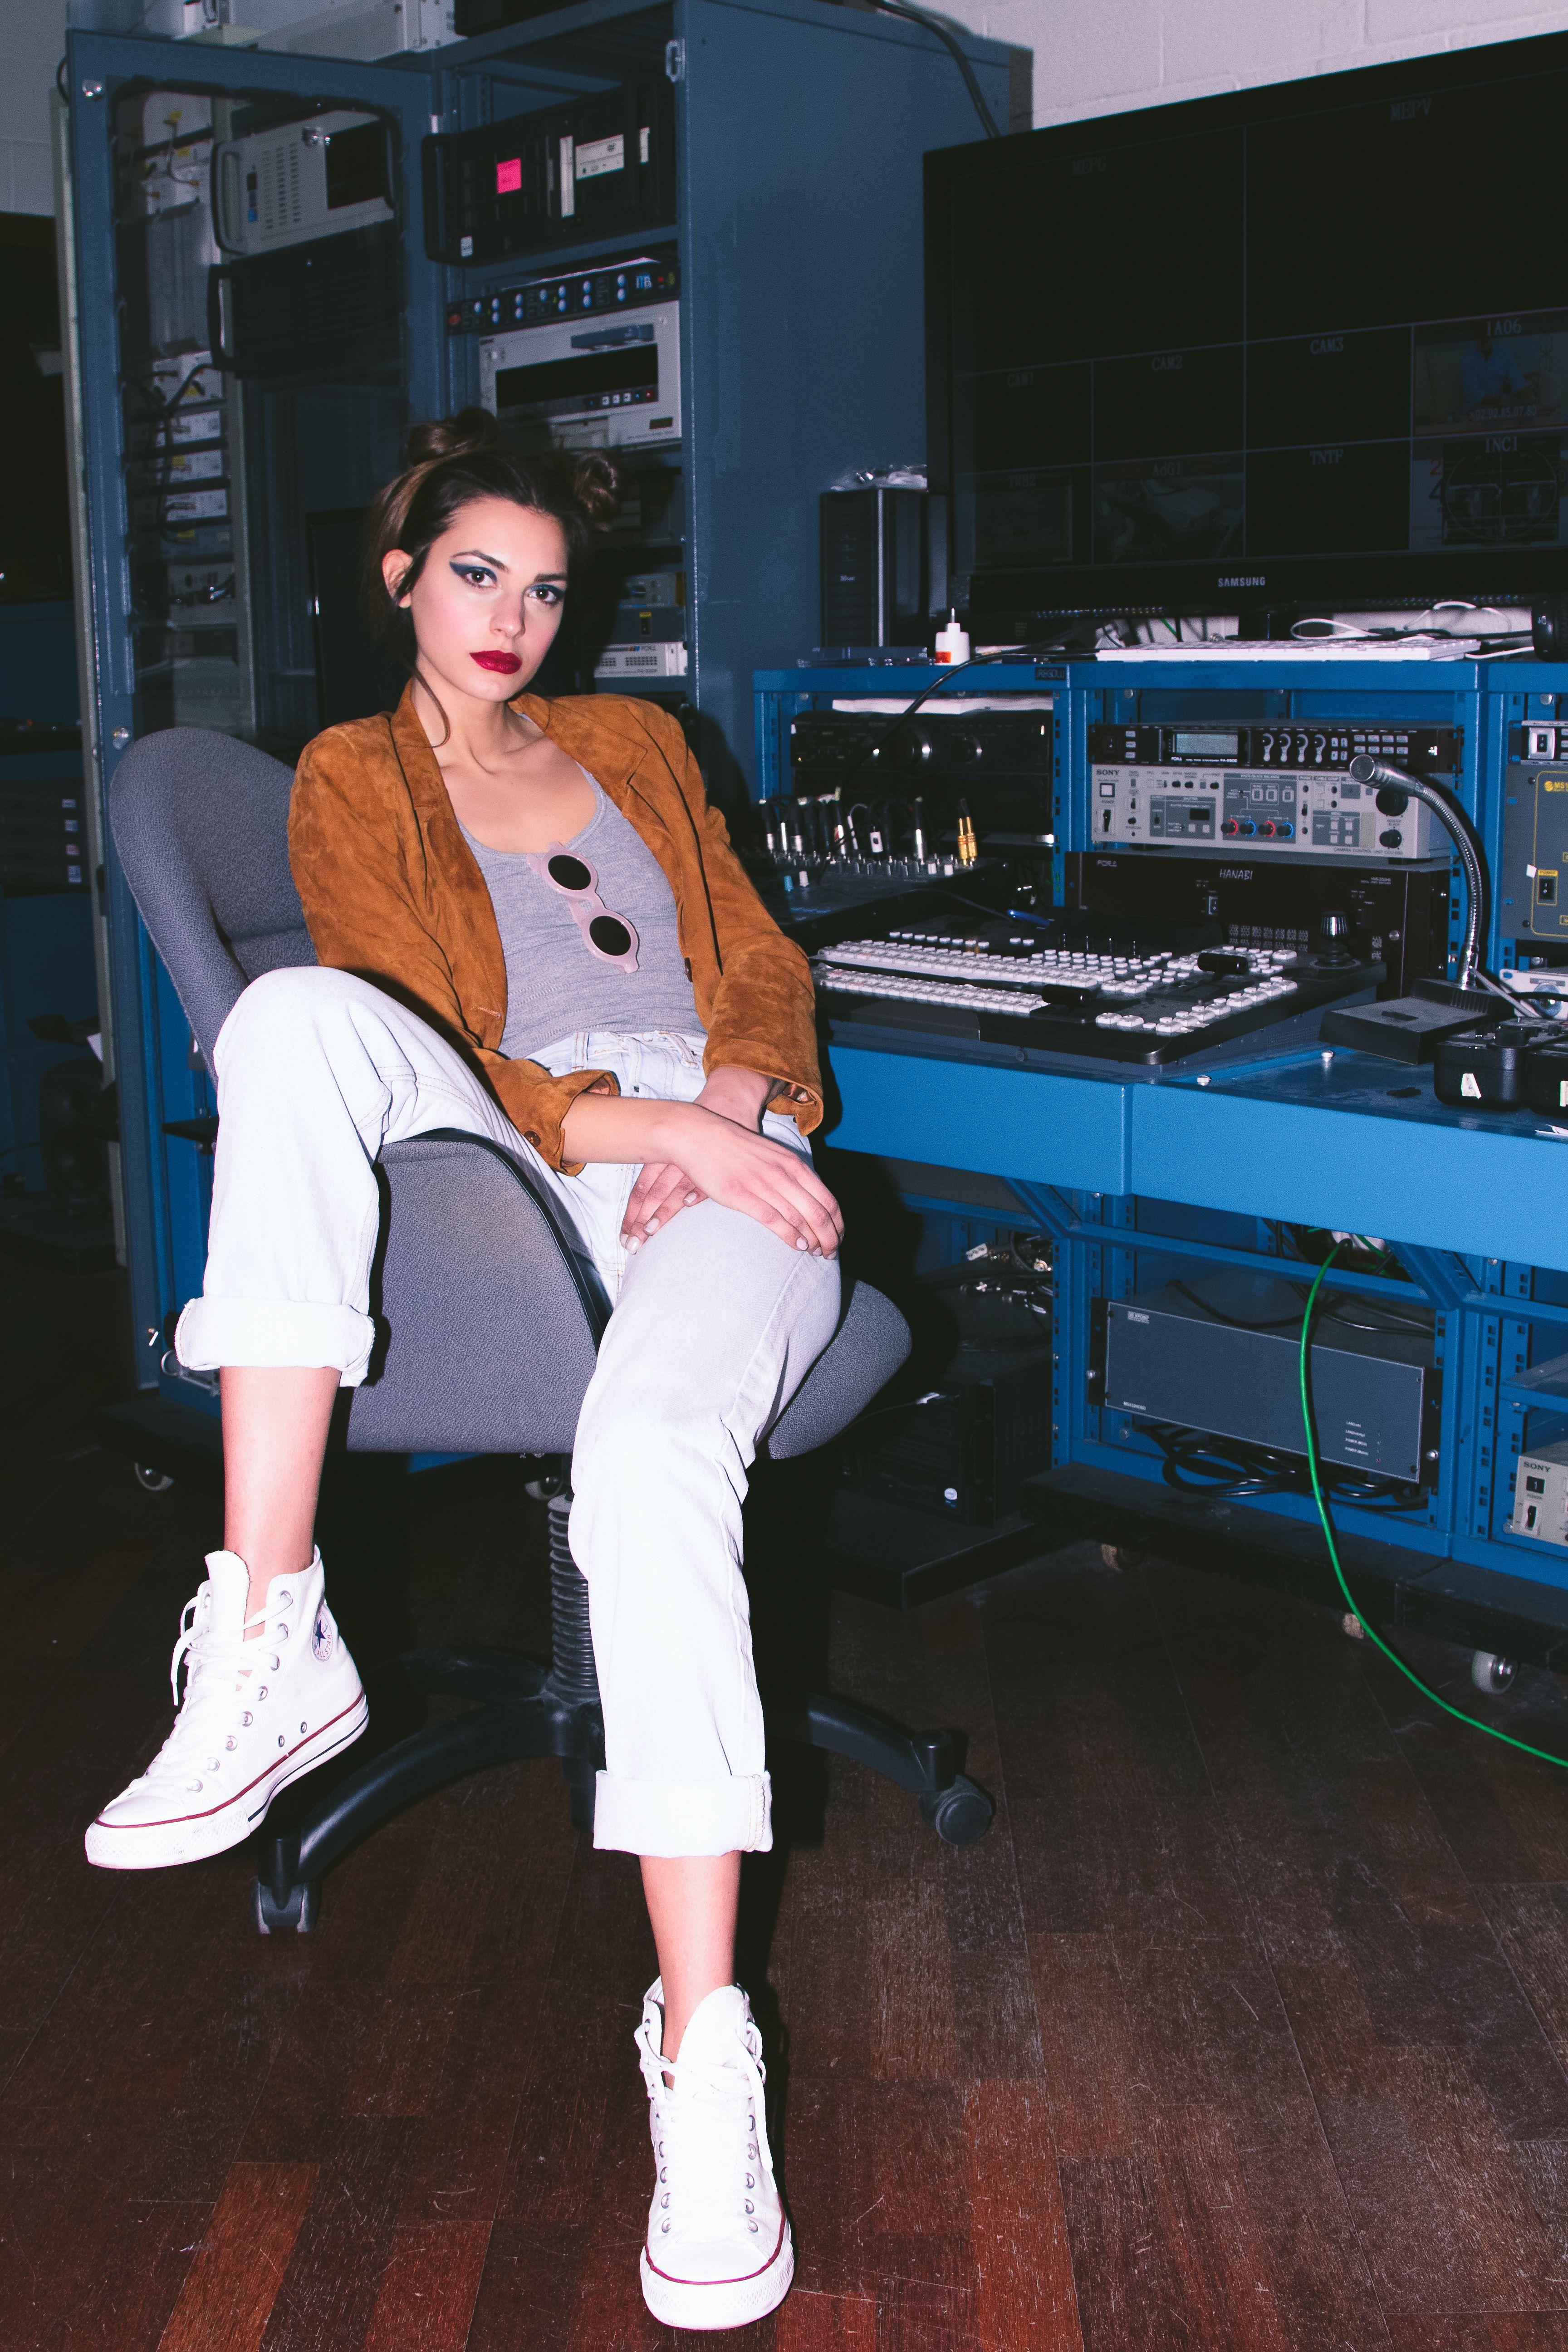 NO SIGNAL EDITORIAL for Feroce Magazine Photographer: Isabella Fresia #isabellafresia Model: Martina Landi @2morrowmodel Stylist: Sebastian Kamilaris #sebastiankamilaris MUA: Eleonora G Pellegrini